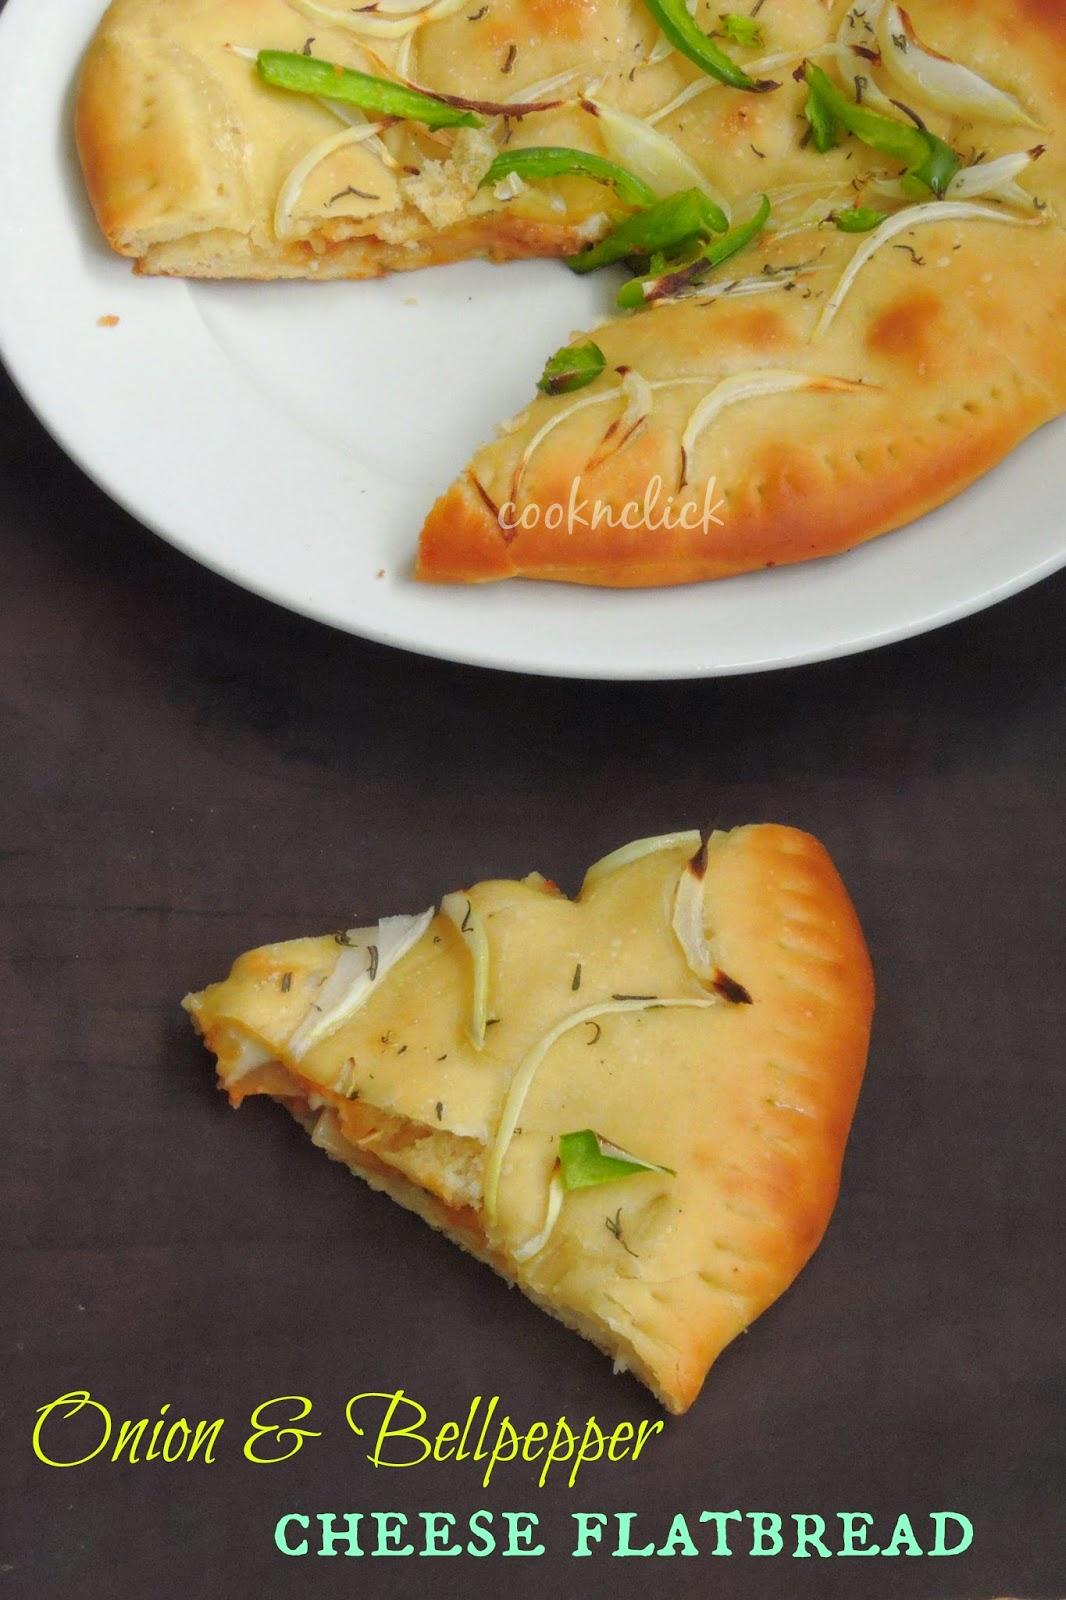 Onion & bellpepper cheese flatbread